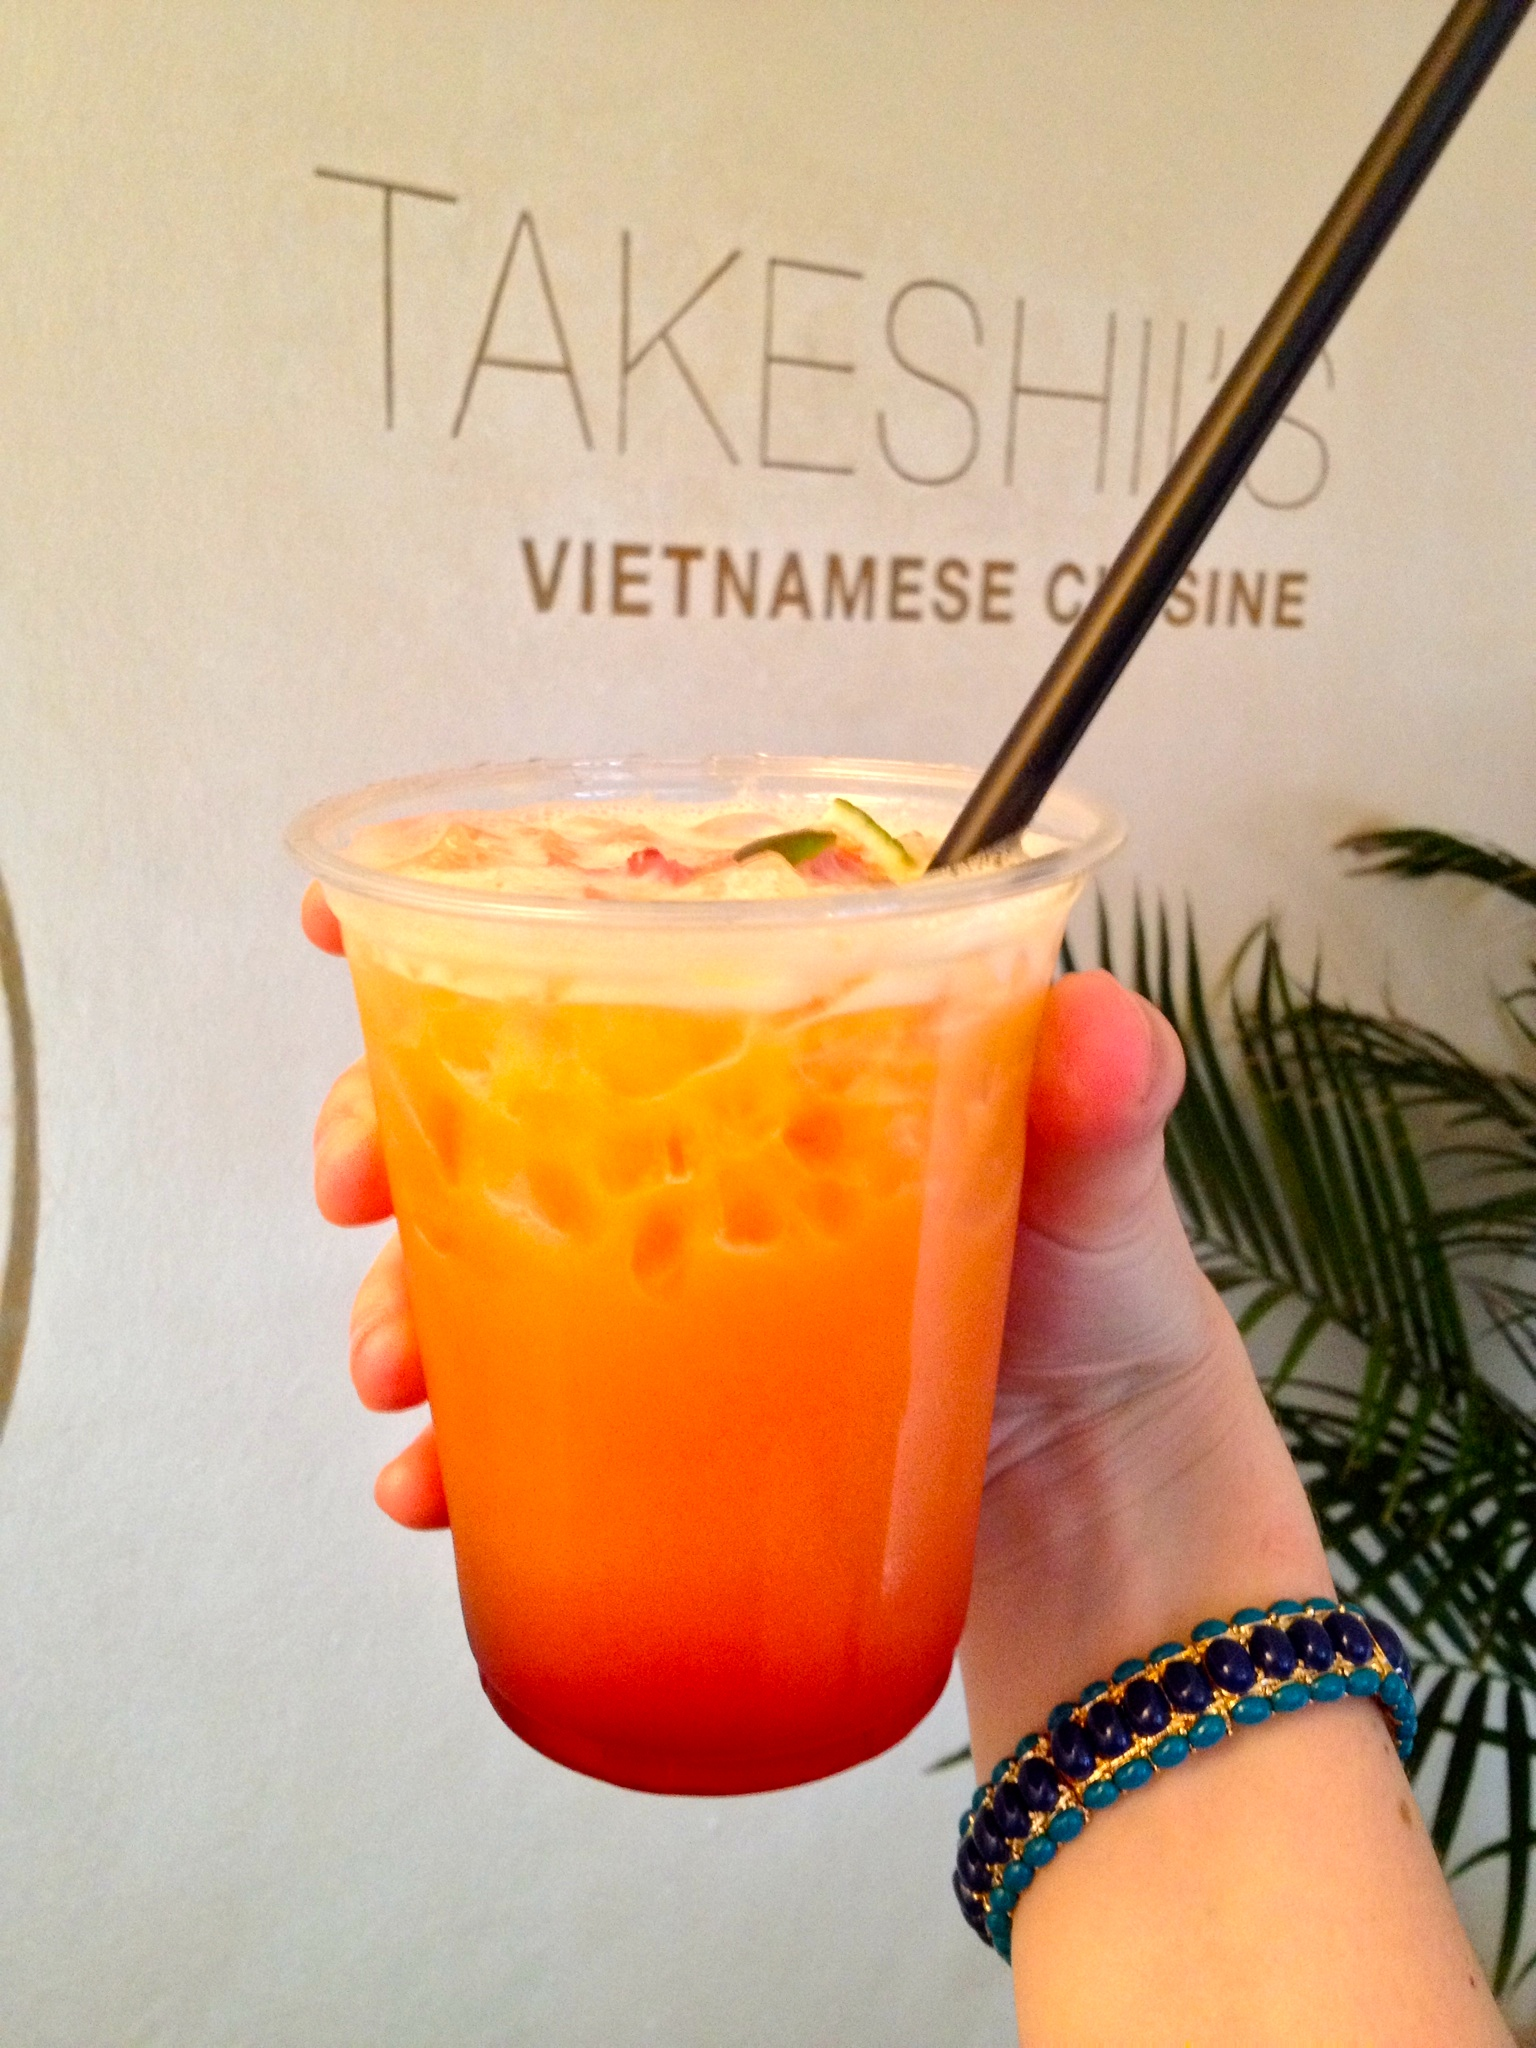 Saigon Love cocktail at Takeshii's